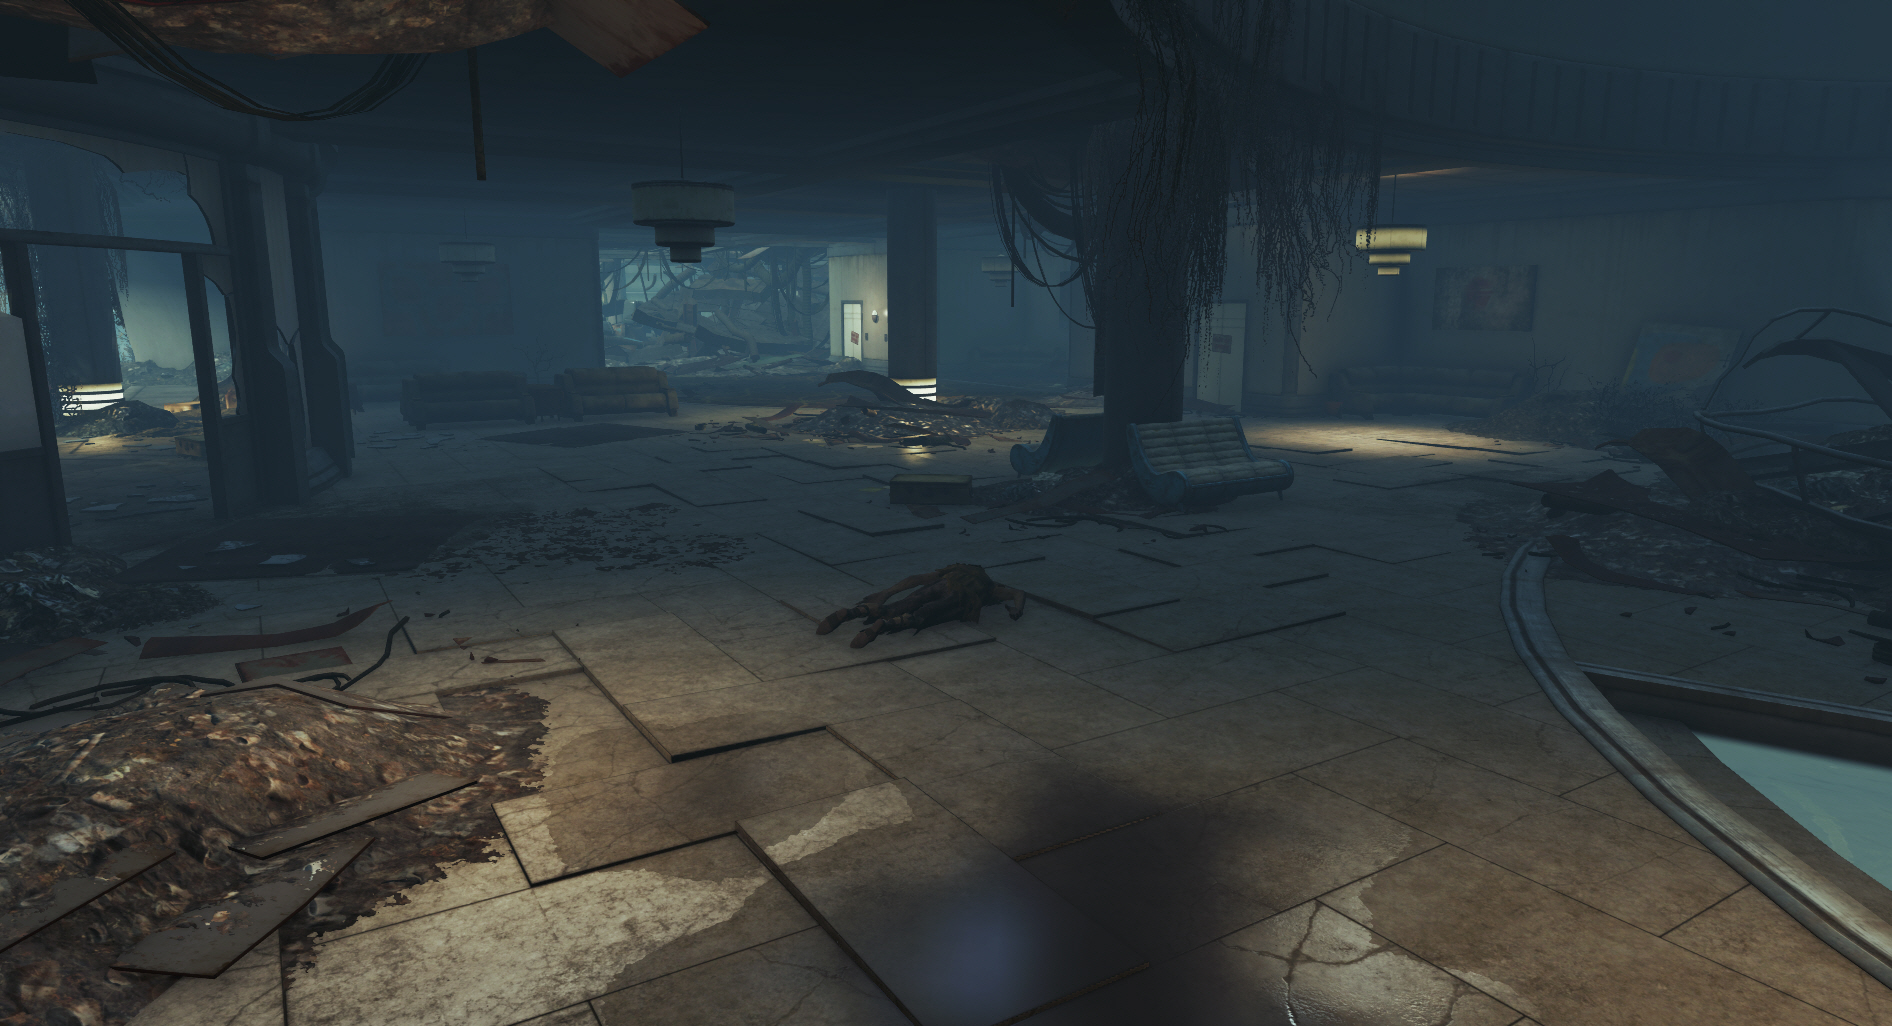 CliffsEdge-Lobby2-FarHarbor